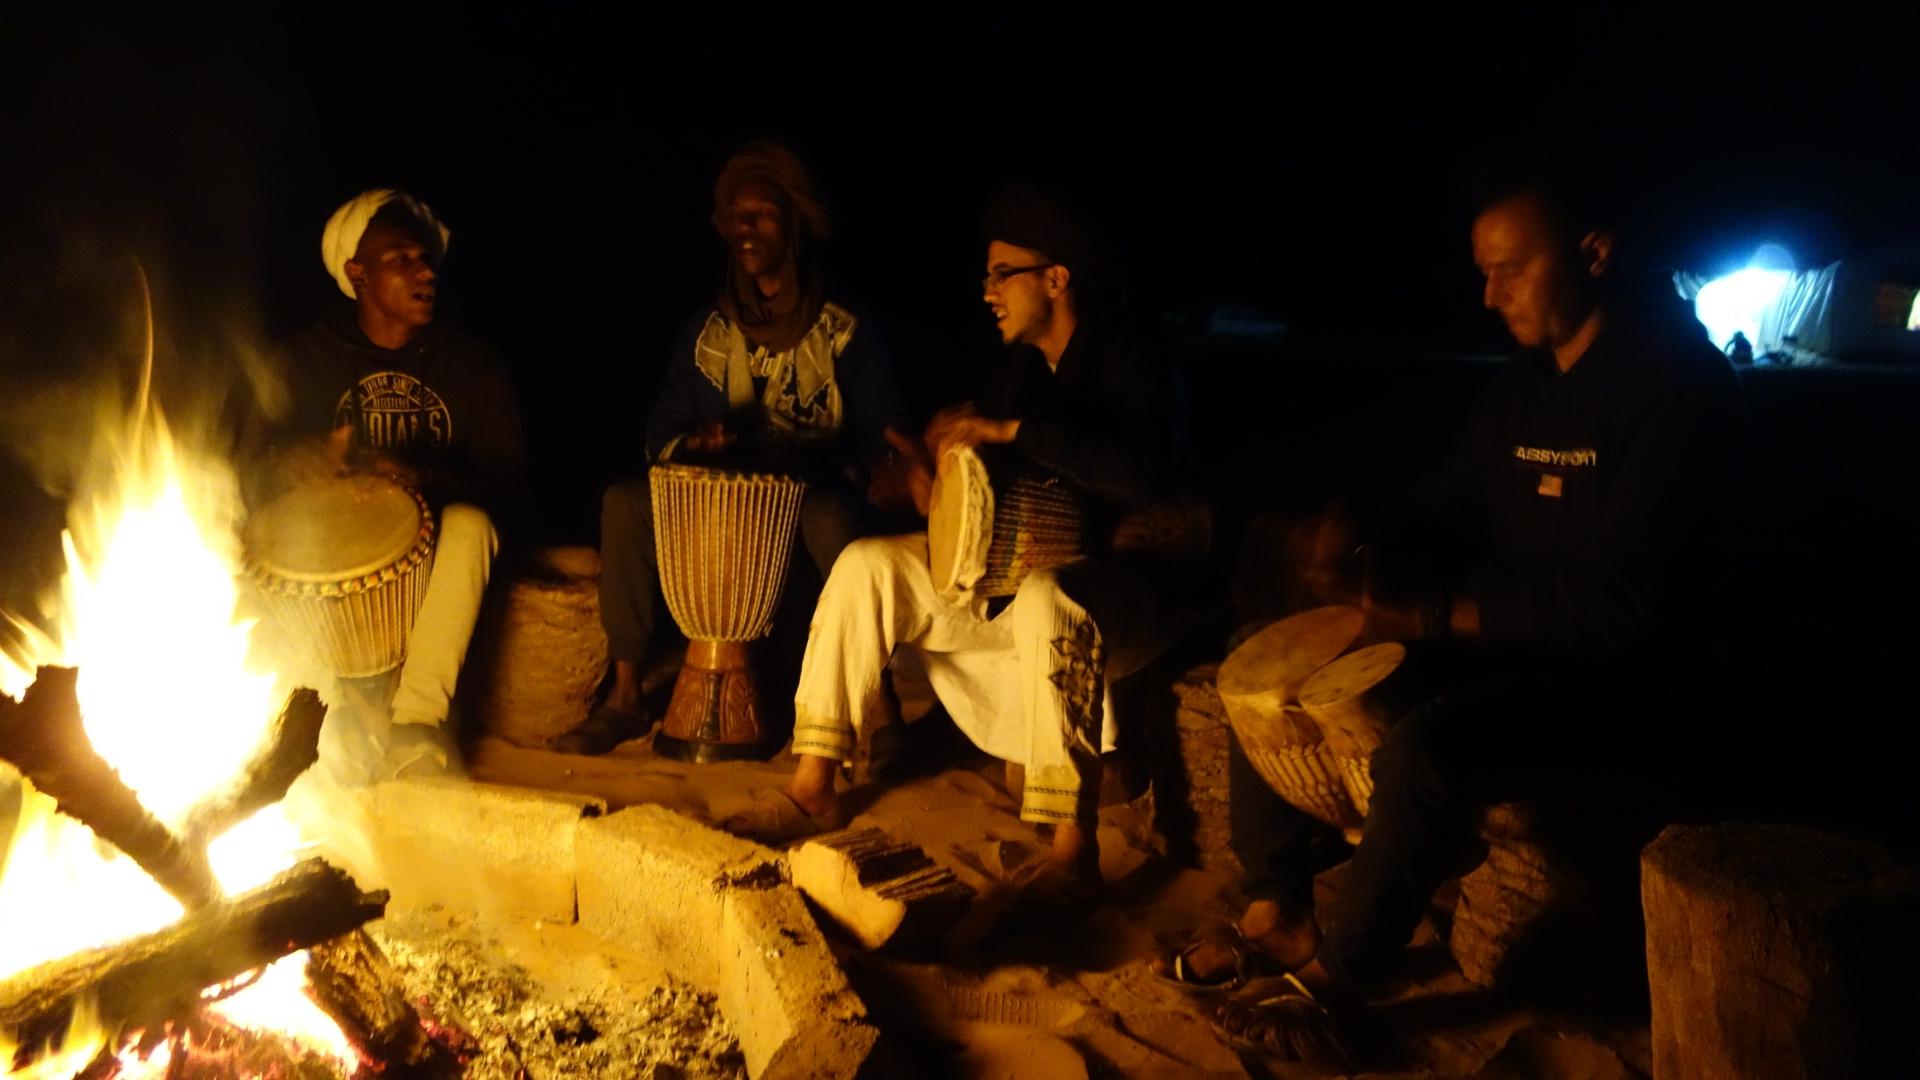 Music et chants traditionels